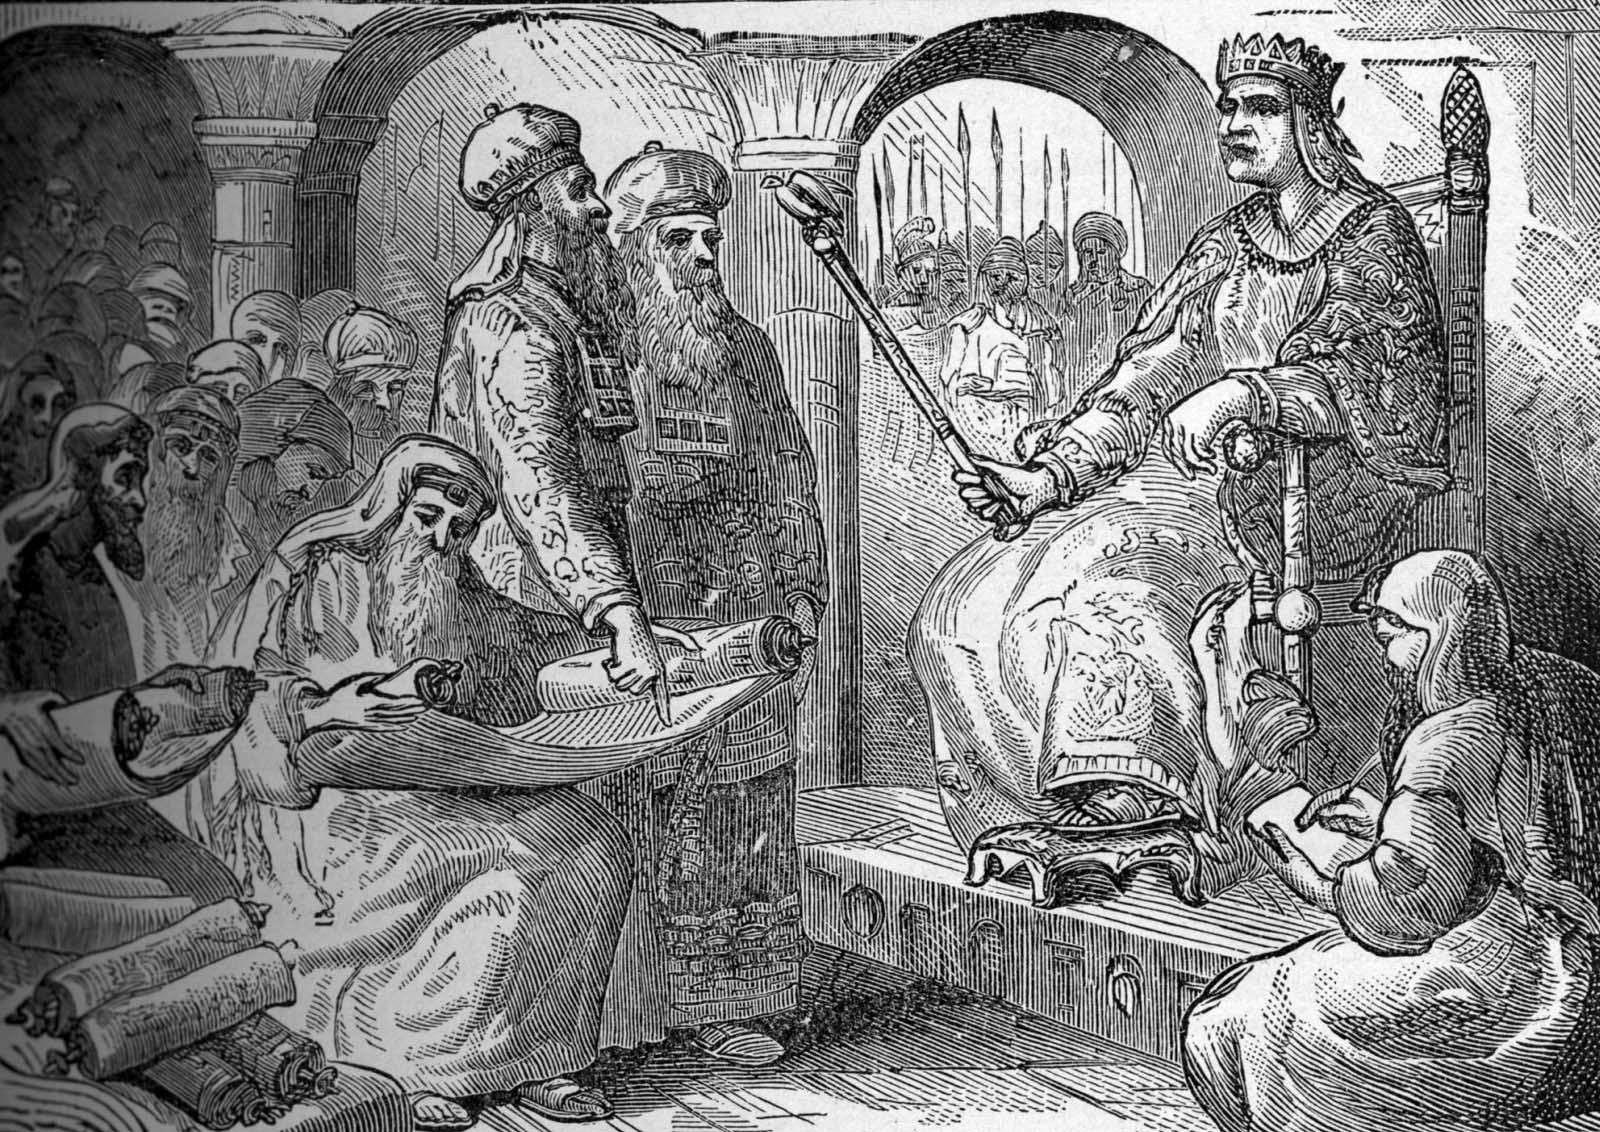 Bible Verse And Image Pulp Fiction Wallpaper: 1280x1024 Pulp Fiction Quotes Bible Ezekiel 1920x1080